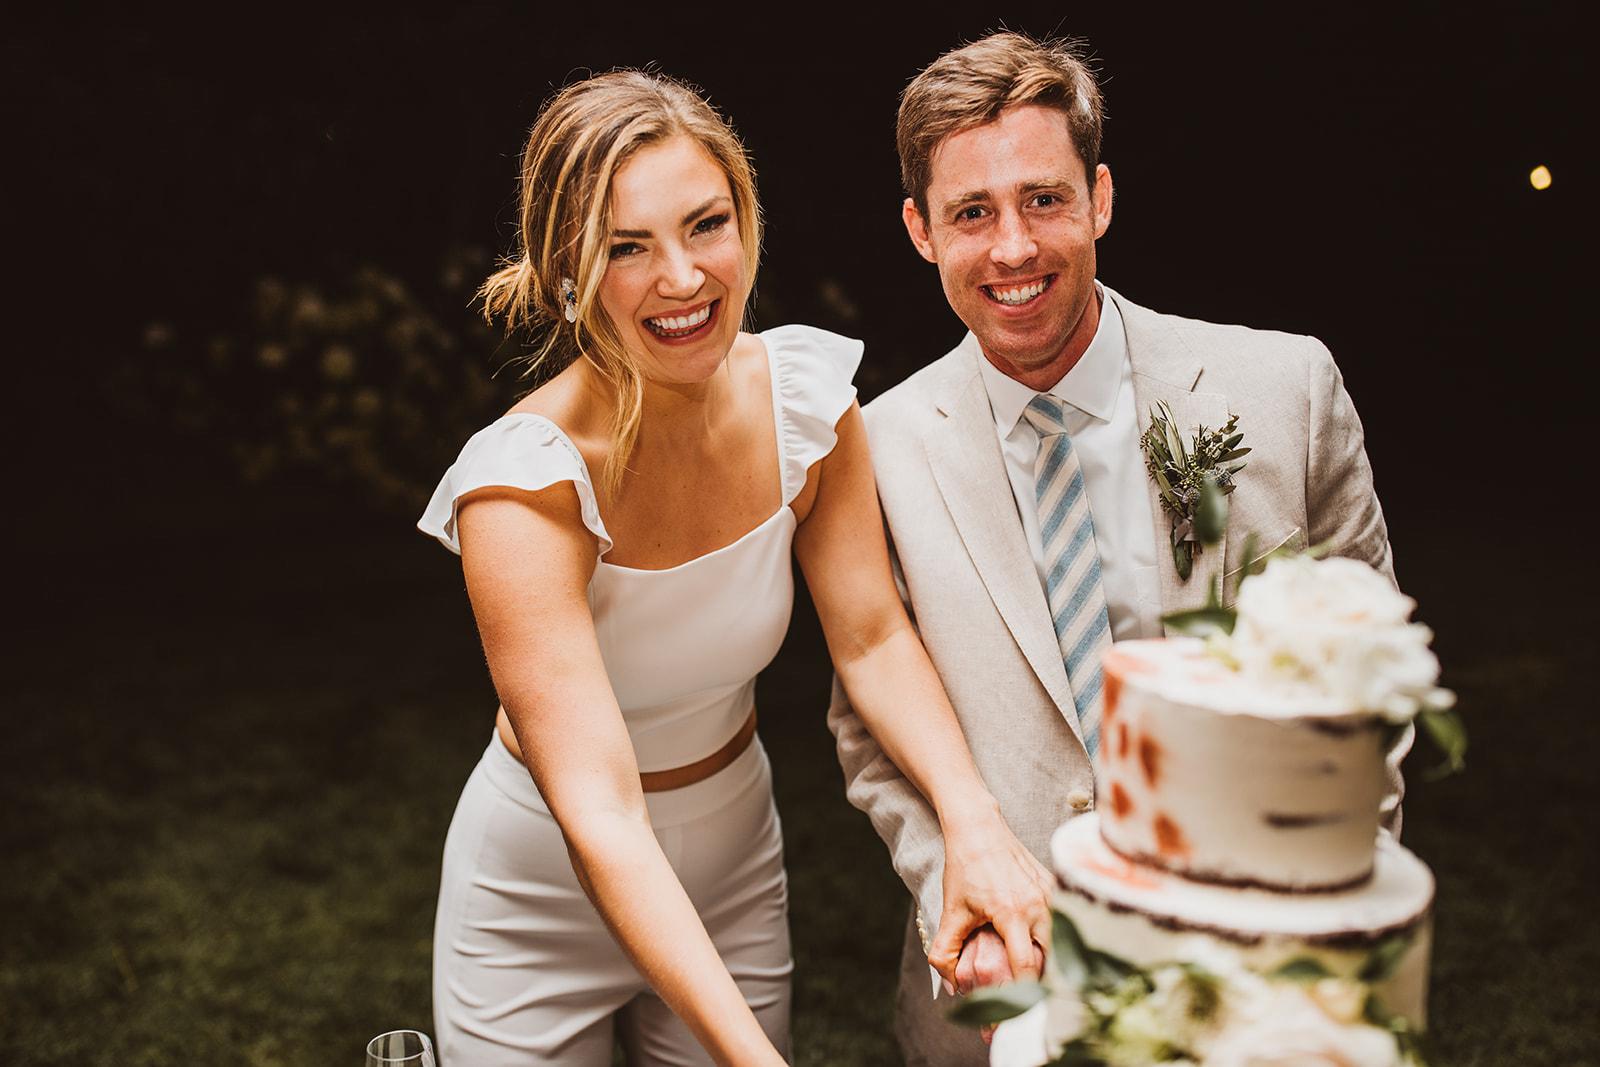 Cream-and-Flutter-Wedding-Cake-Desserts-Leigh-Raleigh-4.jpg